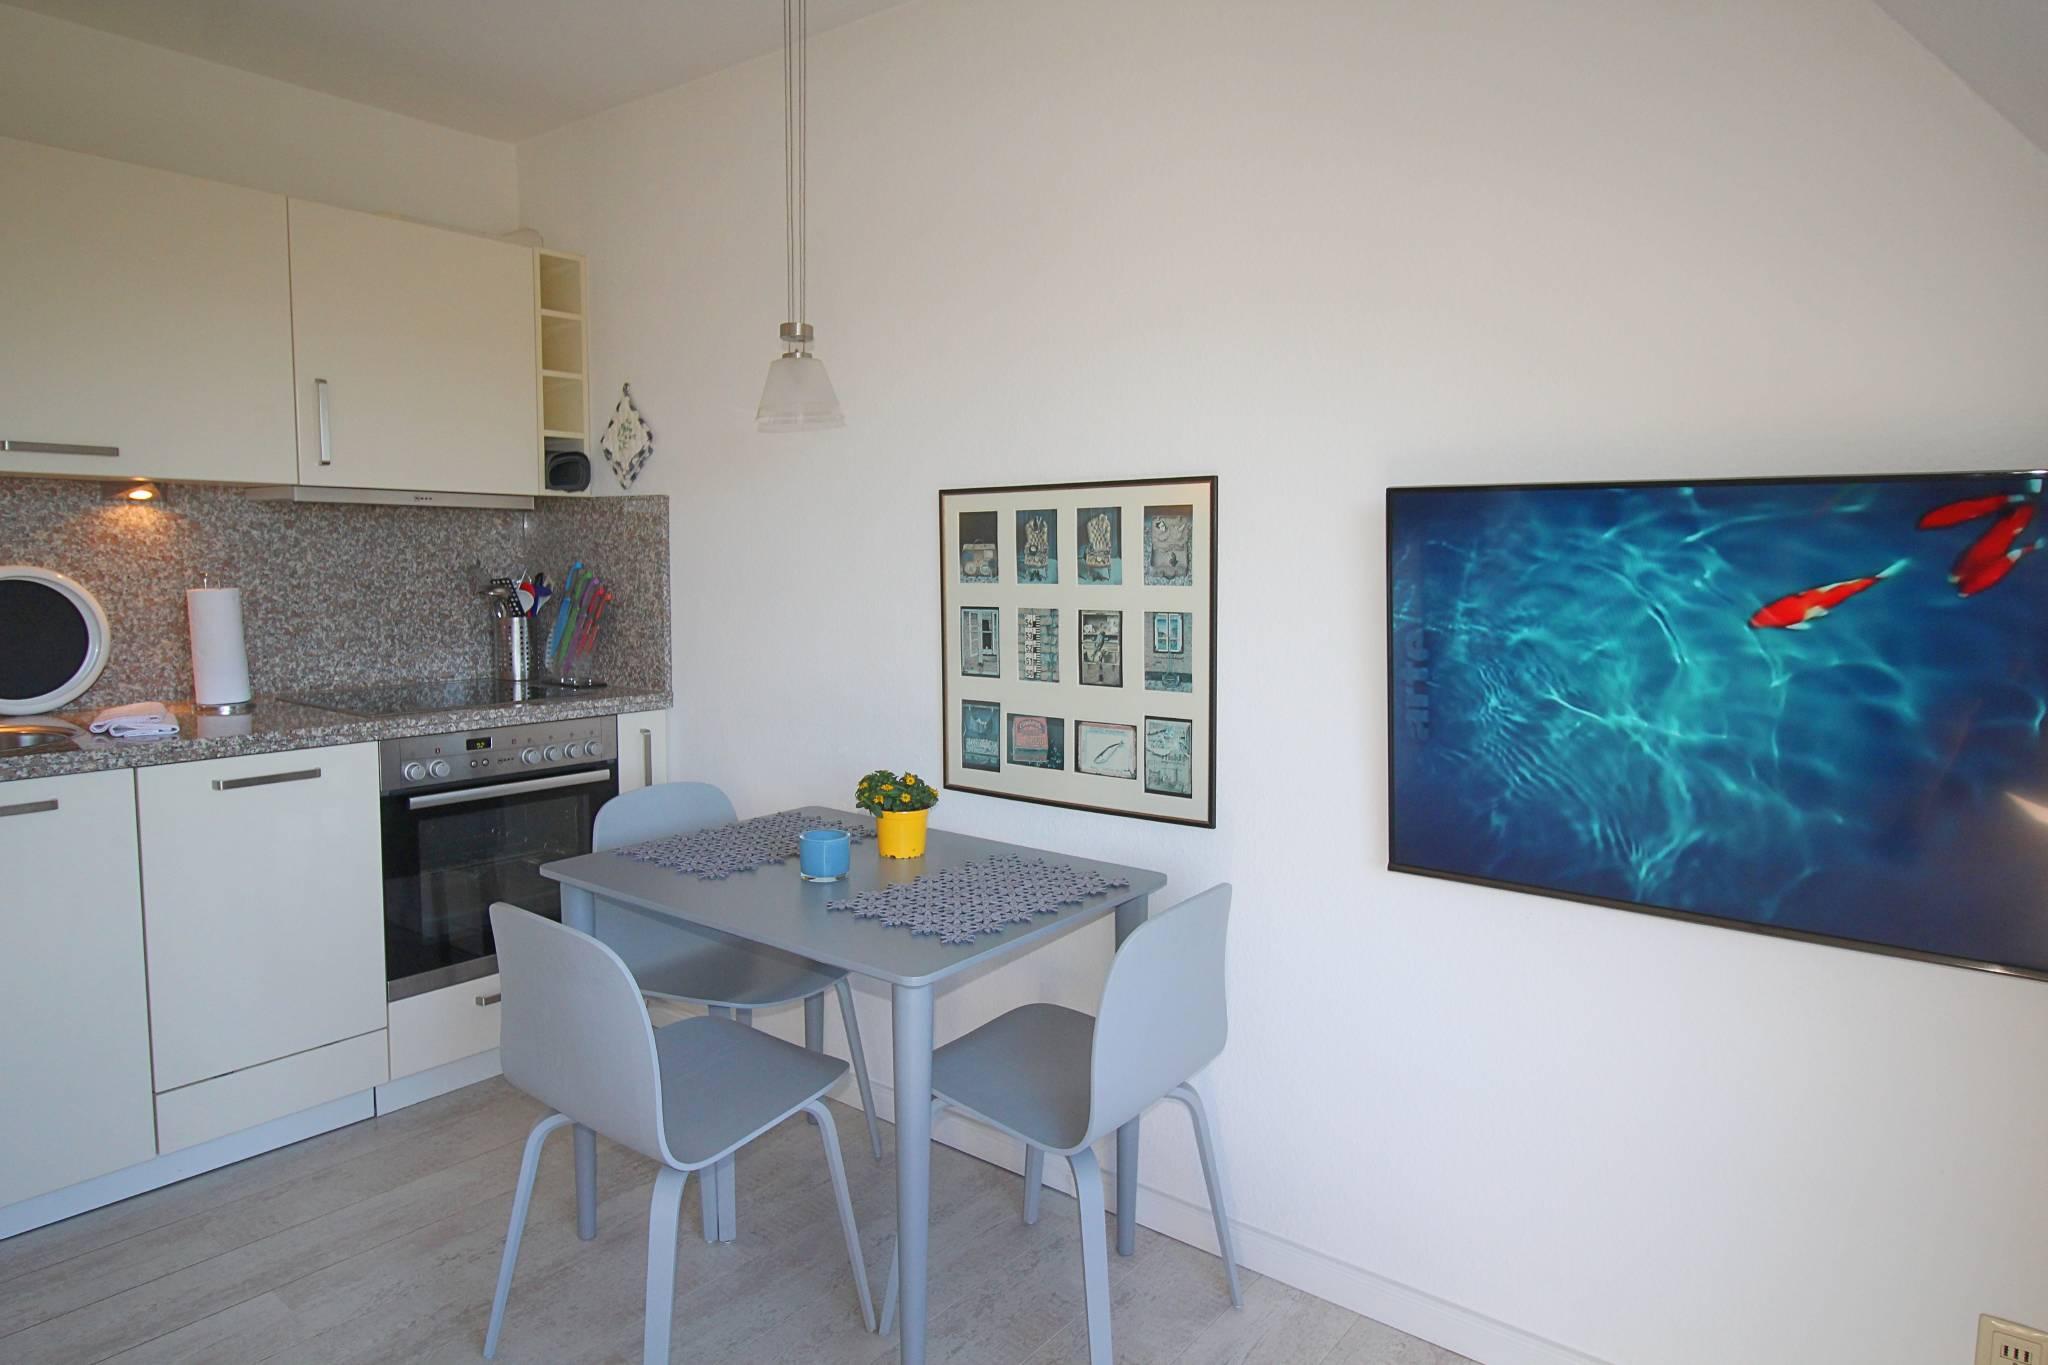 r m hart i ferienwohnung 3 a bildergalerie. Black Bedroom Furniture Sets. Home Design Ideas